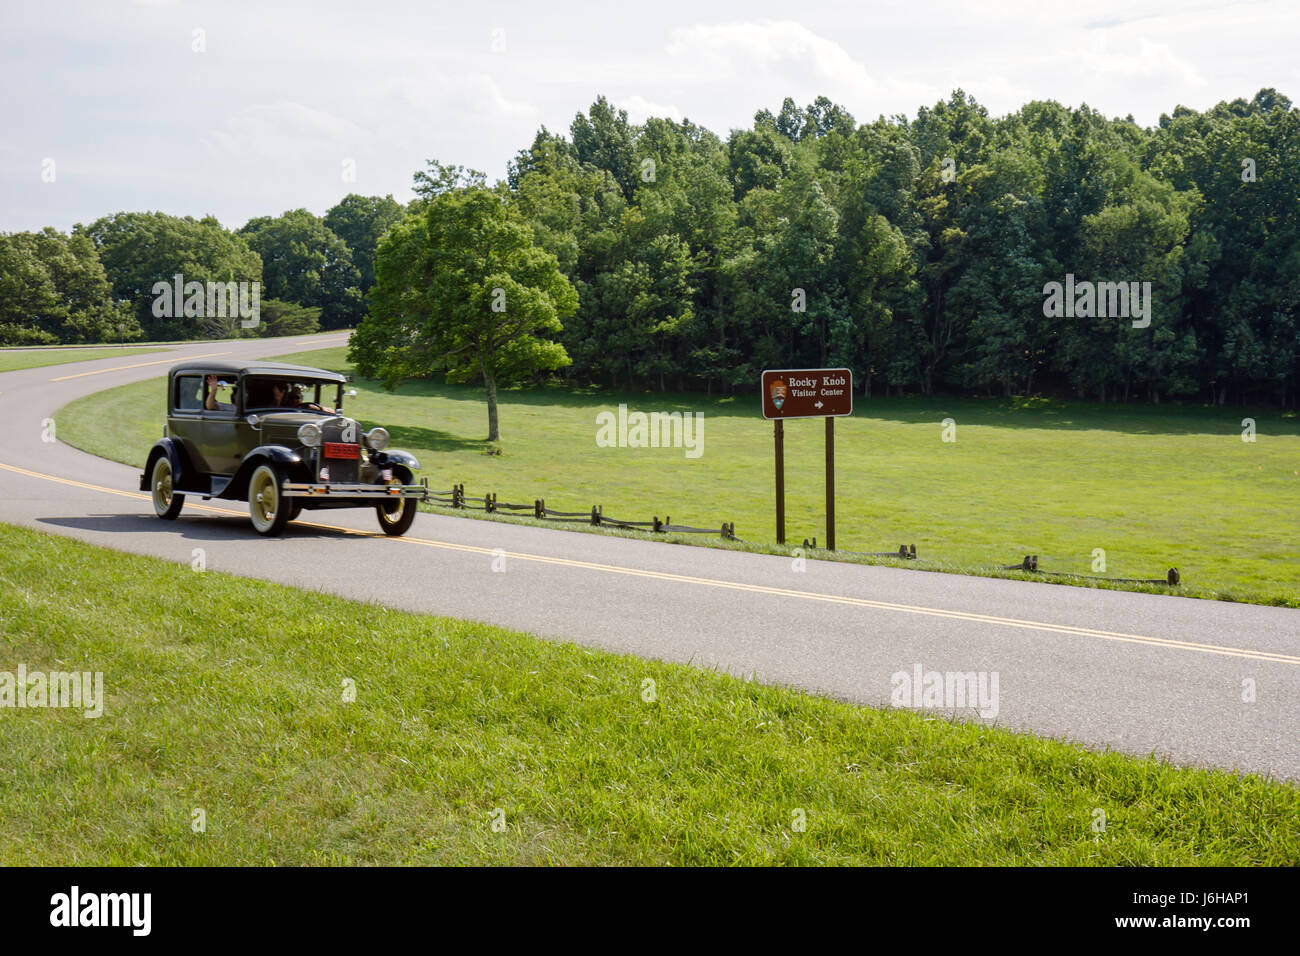 Blue Ridge Parkway Virginia,Appalachian Mountains,Rocky Knob,antique car,Model A Ford,sign,road,grassy field,VA090621068 Stock Photo